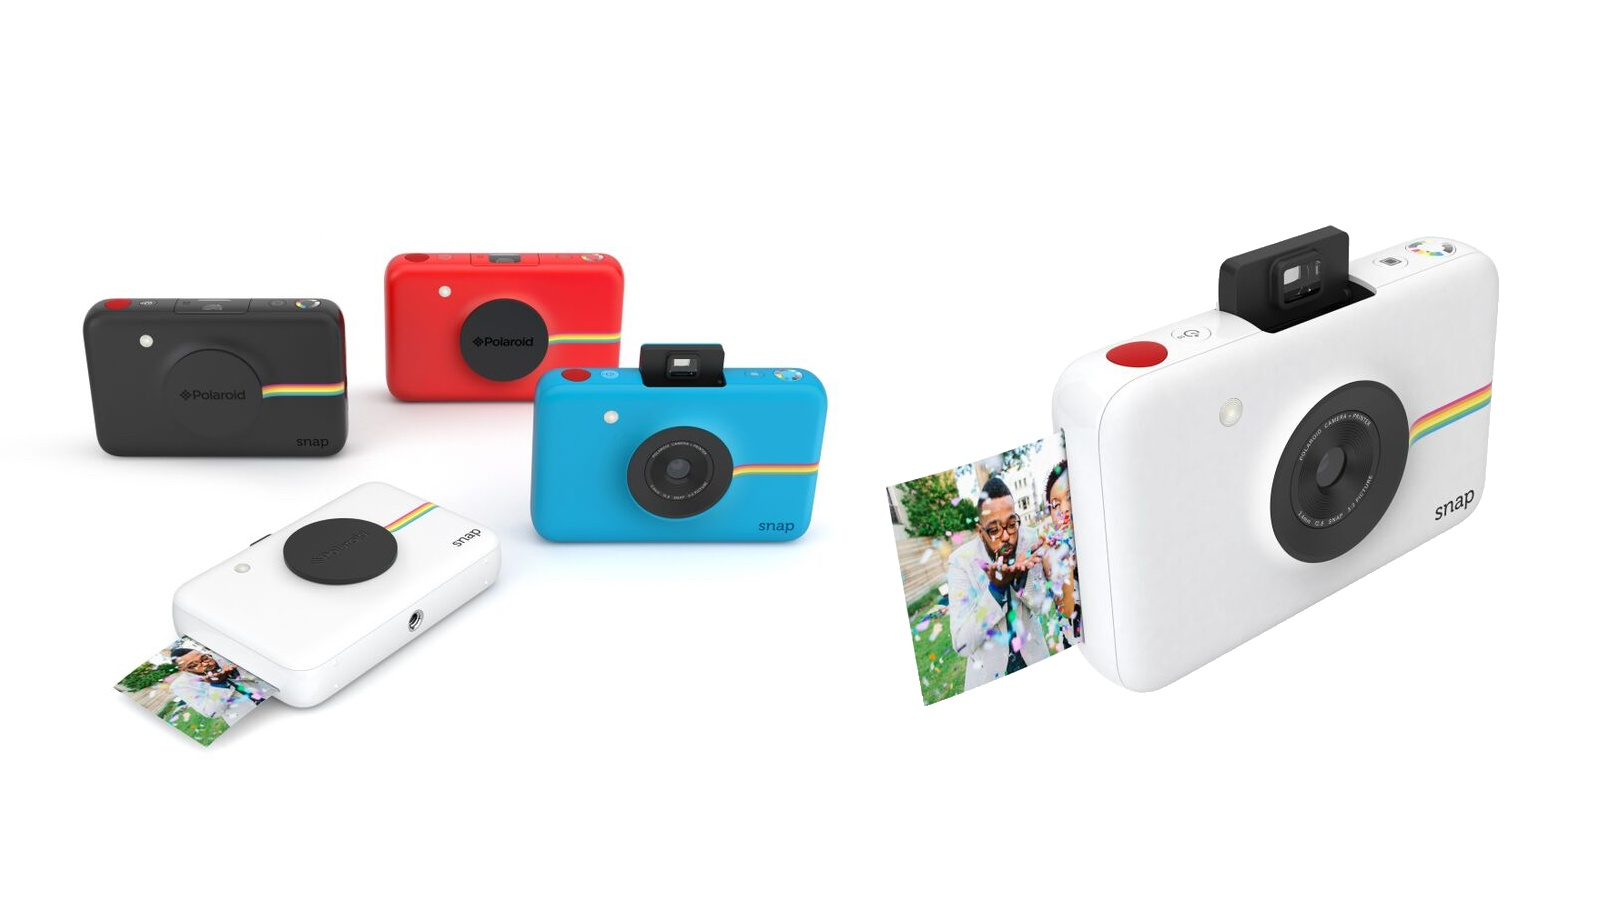 pocket-size-polaroid-spits-out-instant-prints-image-cultofandroidcomwp-contentuploads201509polaroid-snap-instagram-jpg